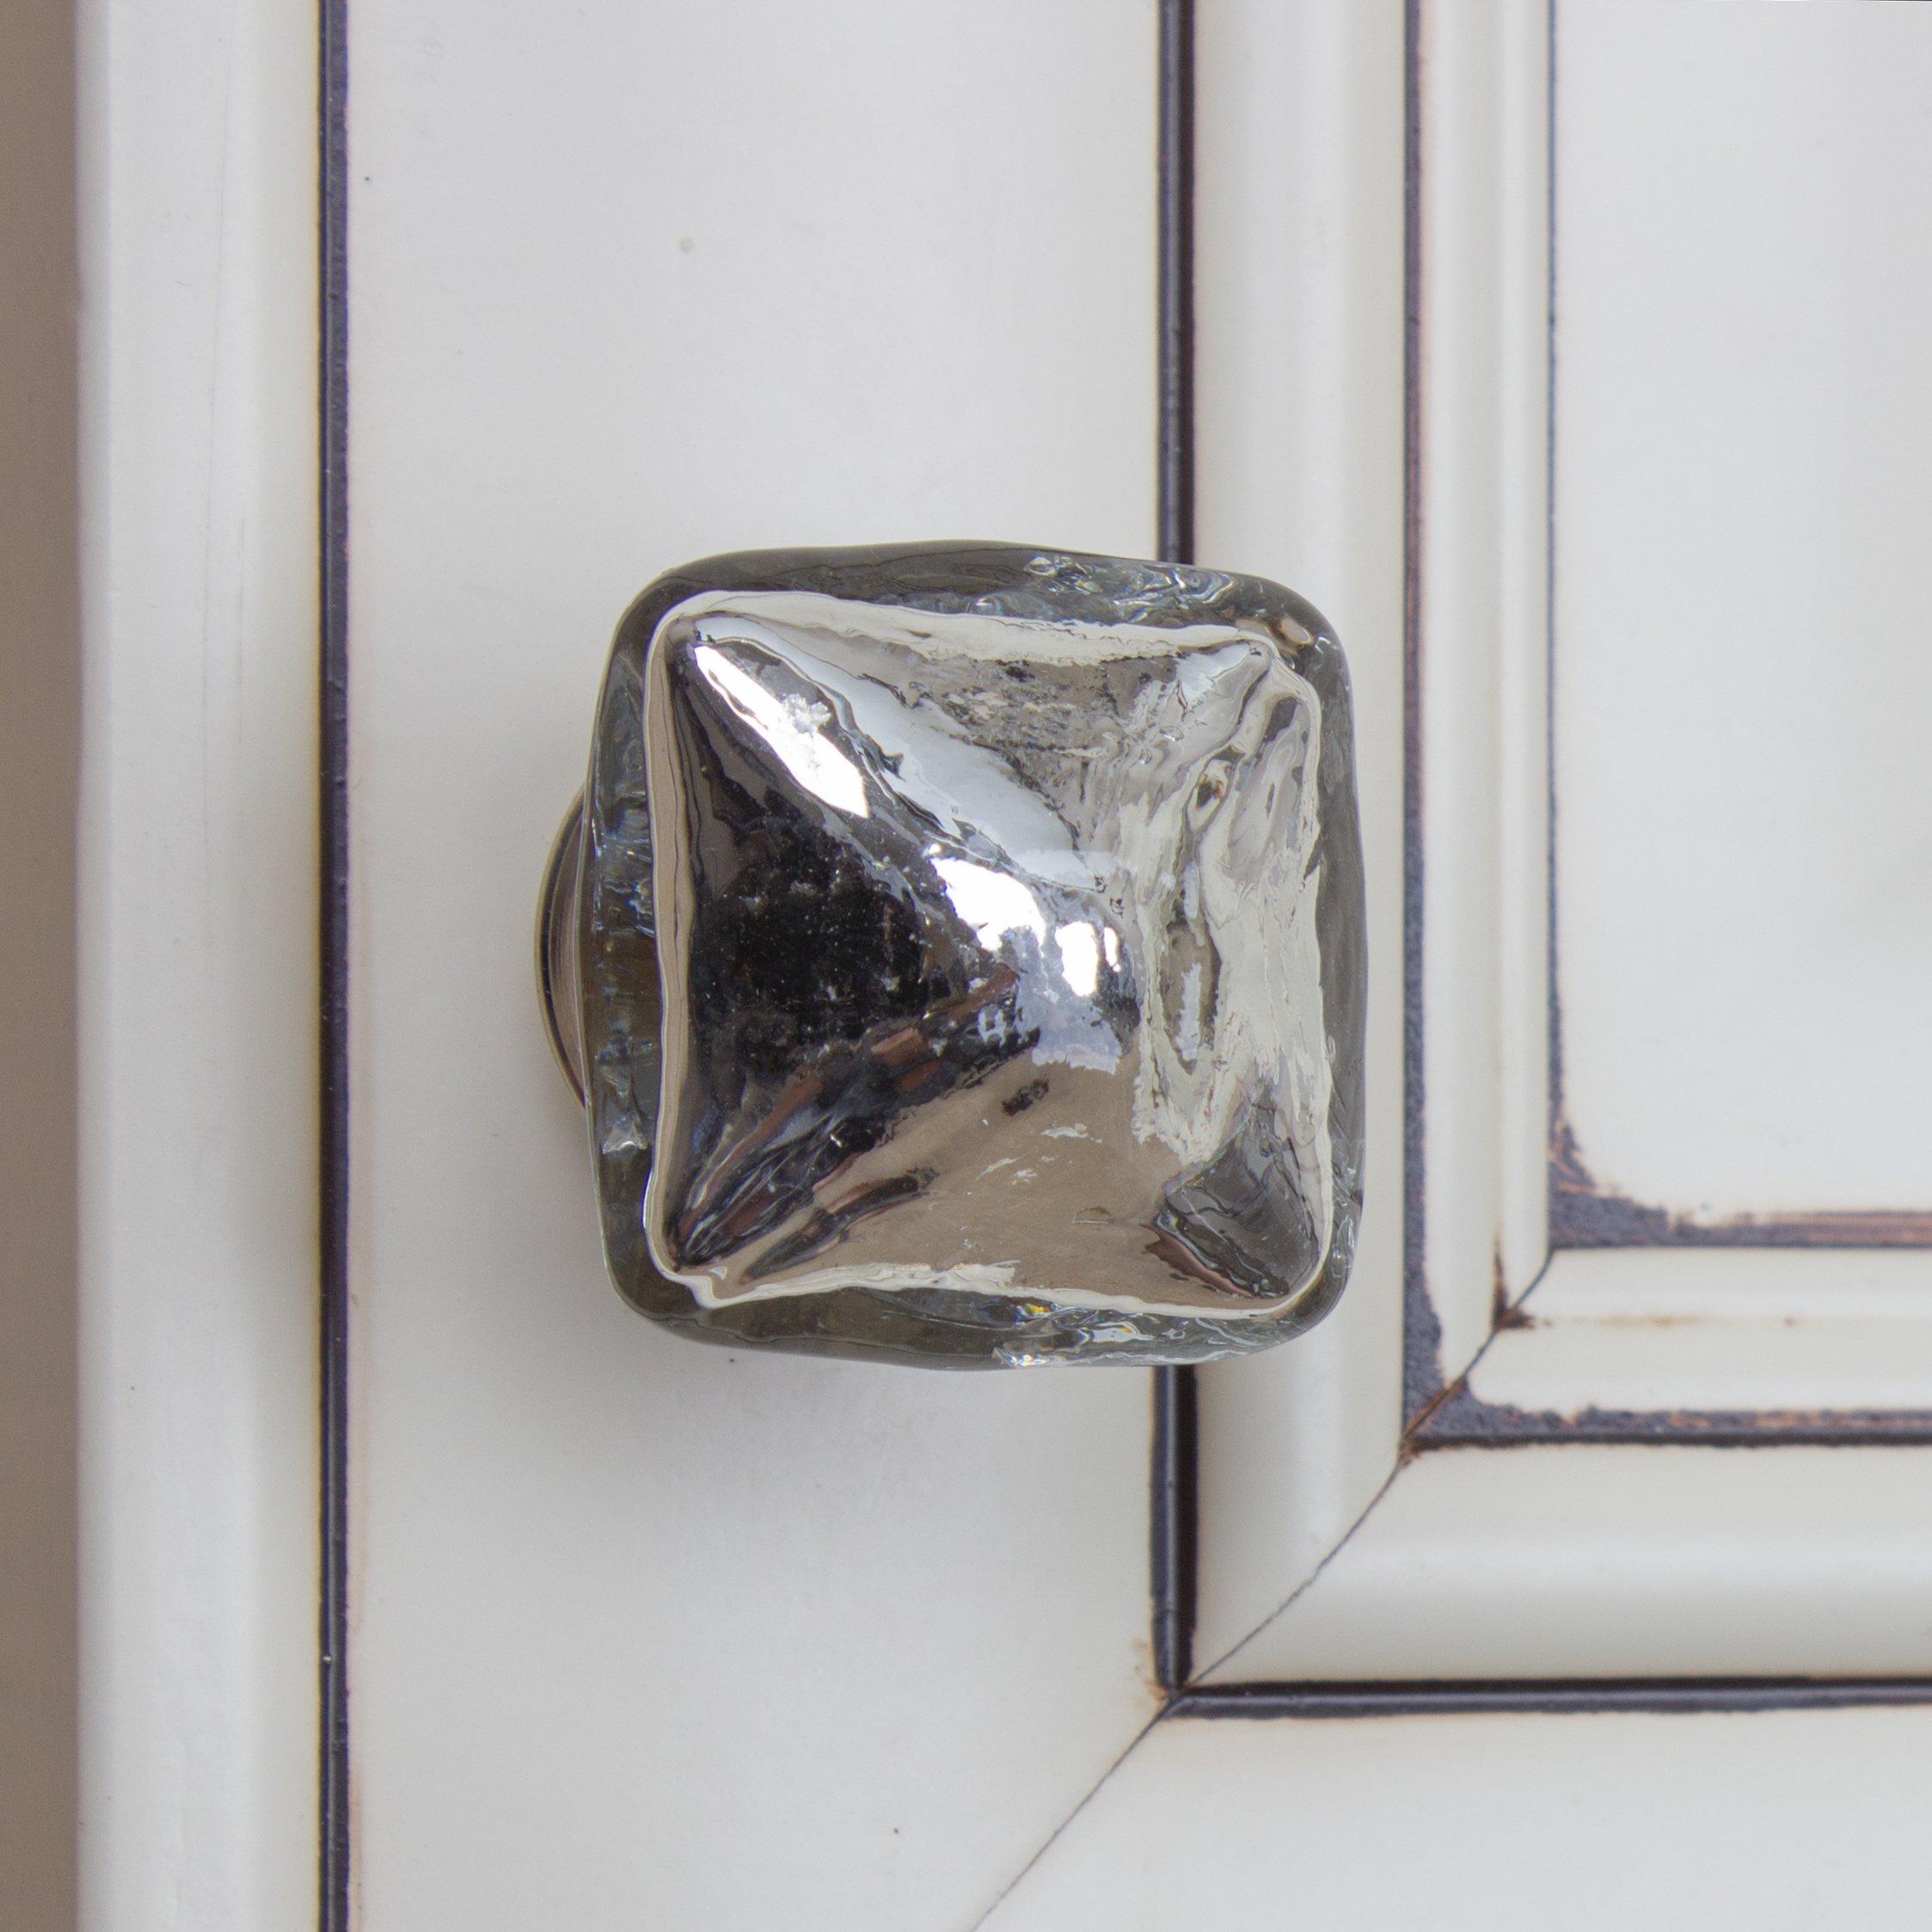 GlideRite Hardware 231010-M-25 Pyramid Mercury Glass Cabinet Knobs, 25 Pack, 1.25'', Silver Vintage Mercury Glass by GlideRite Hardware (Image #3)